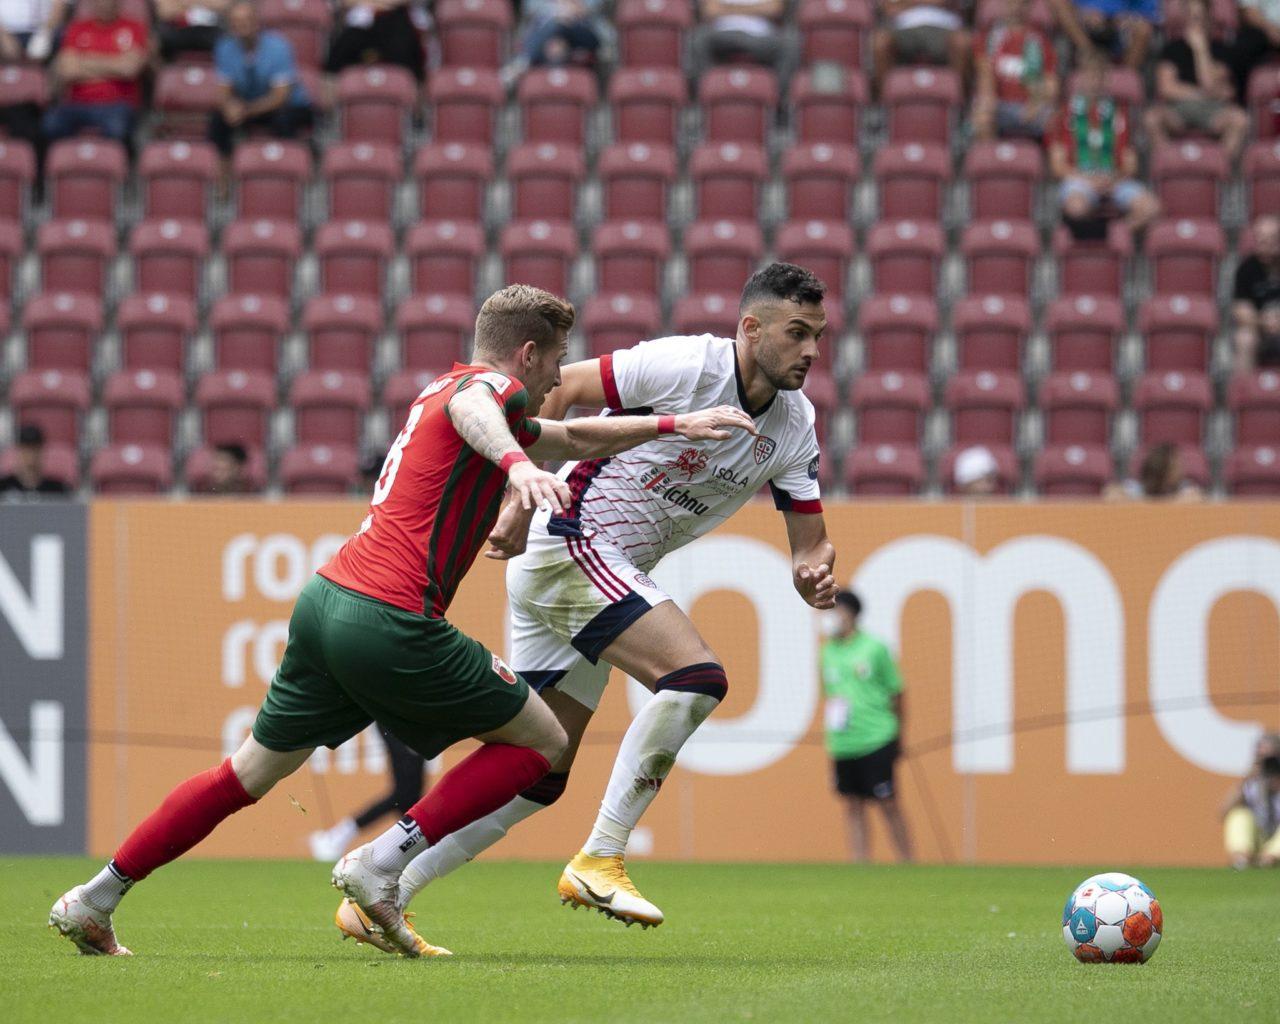 Friendly: Cagliari bow to Augsburg